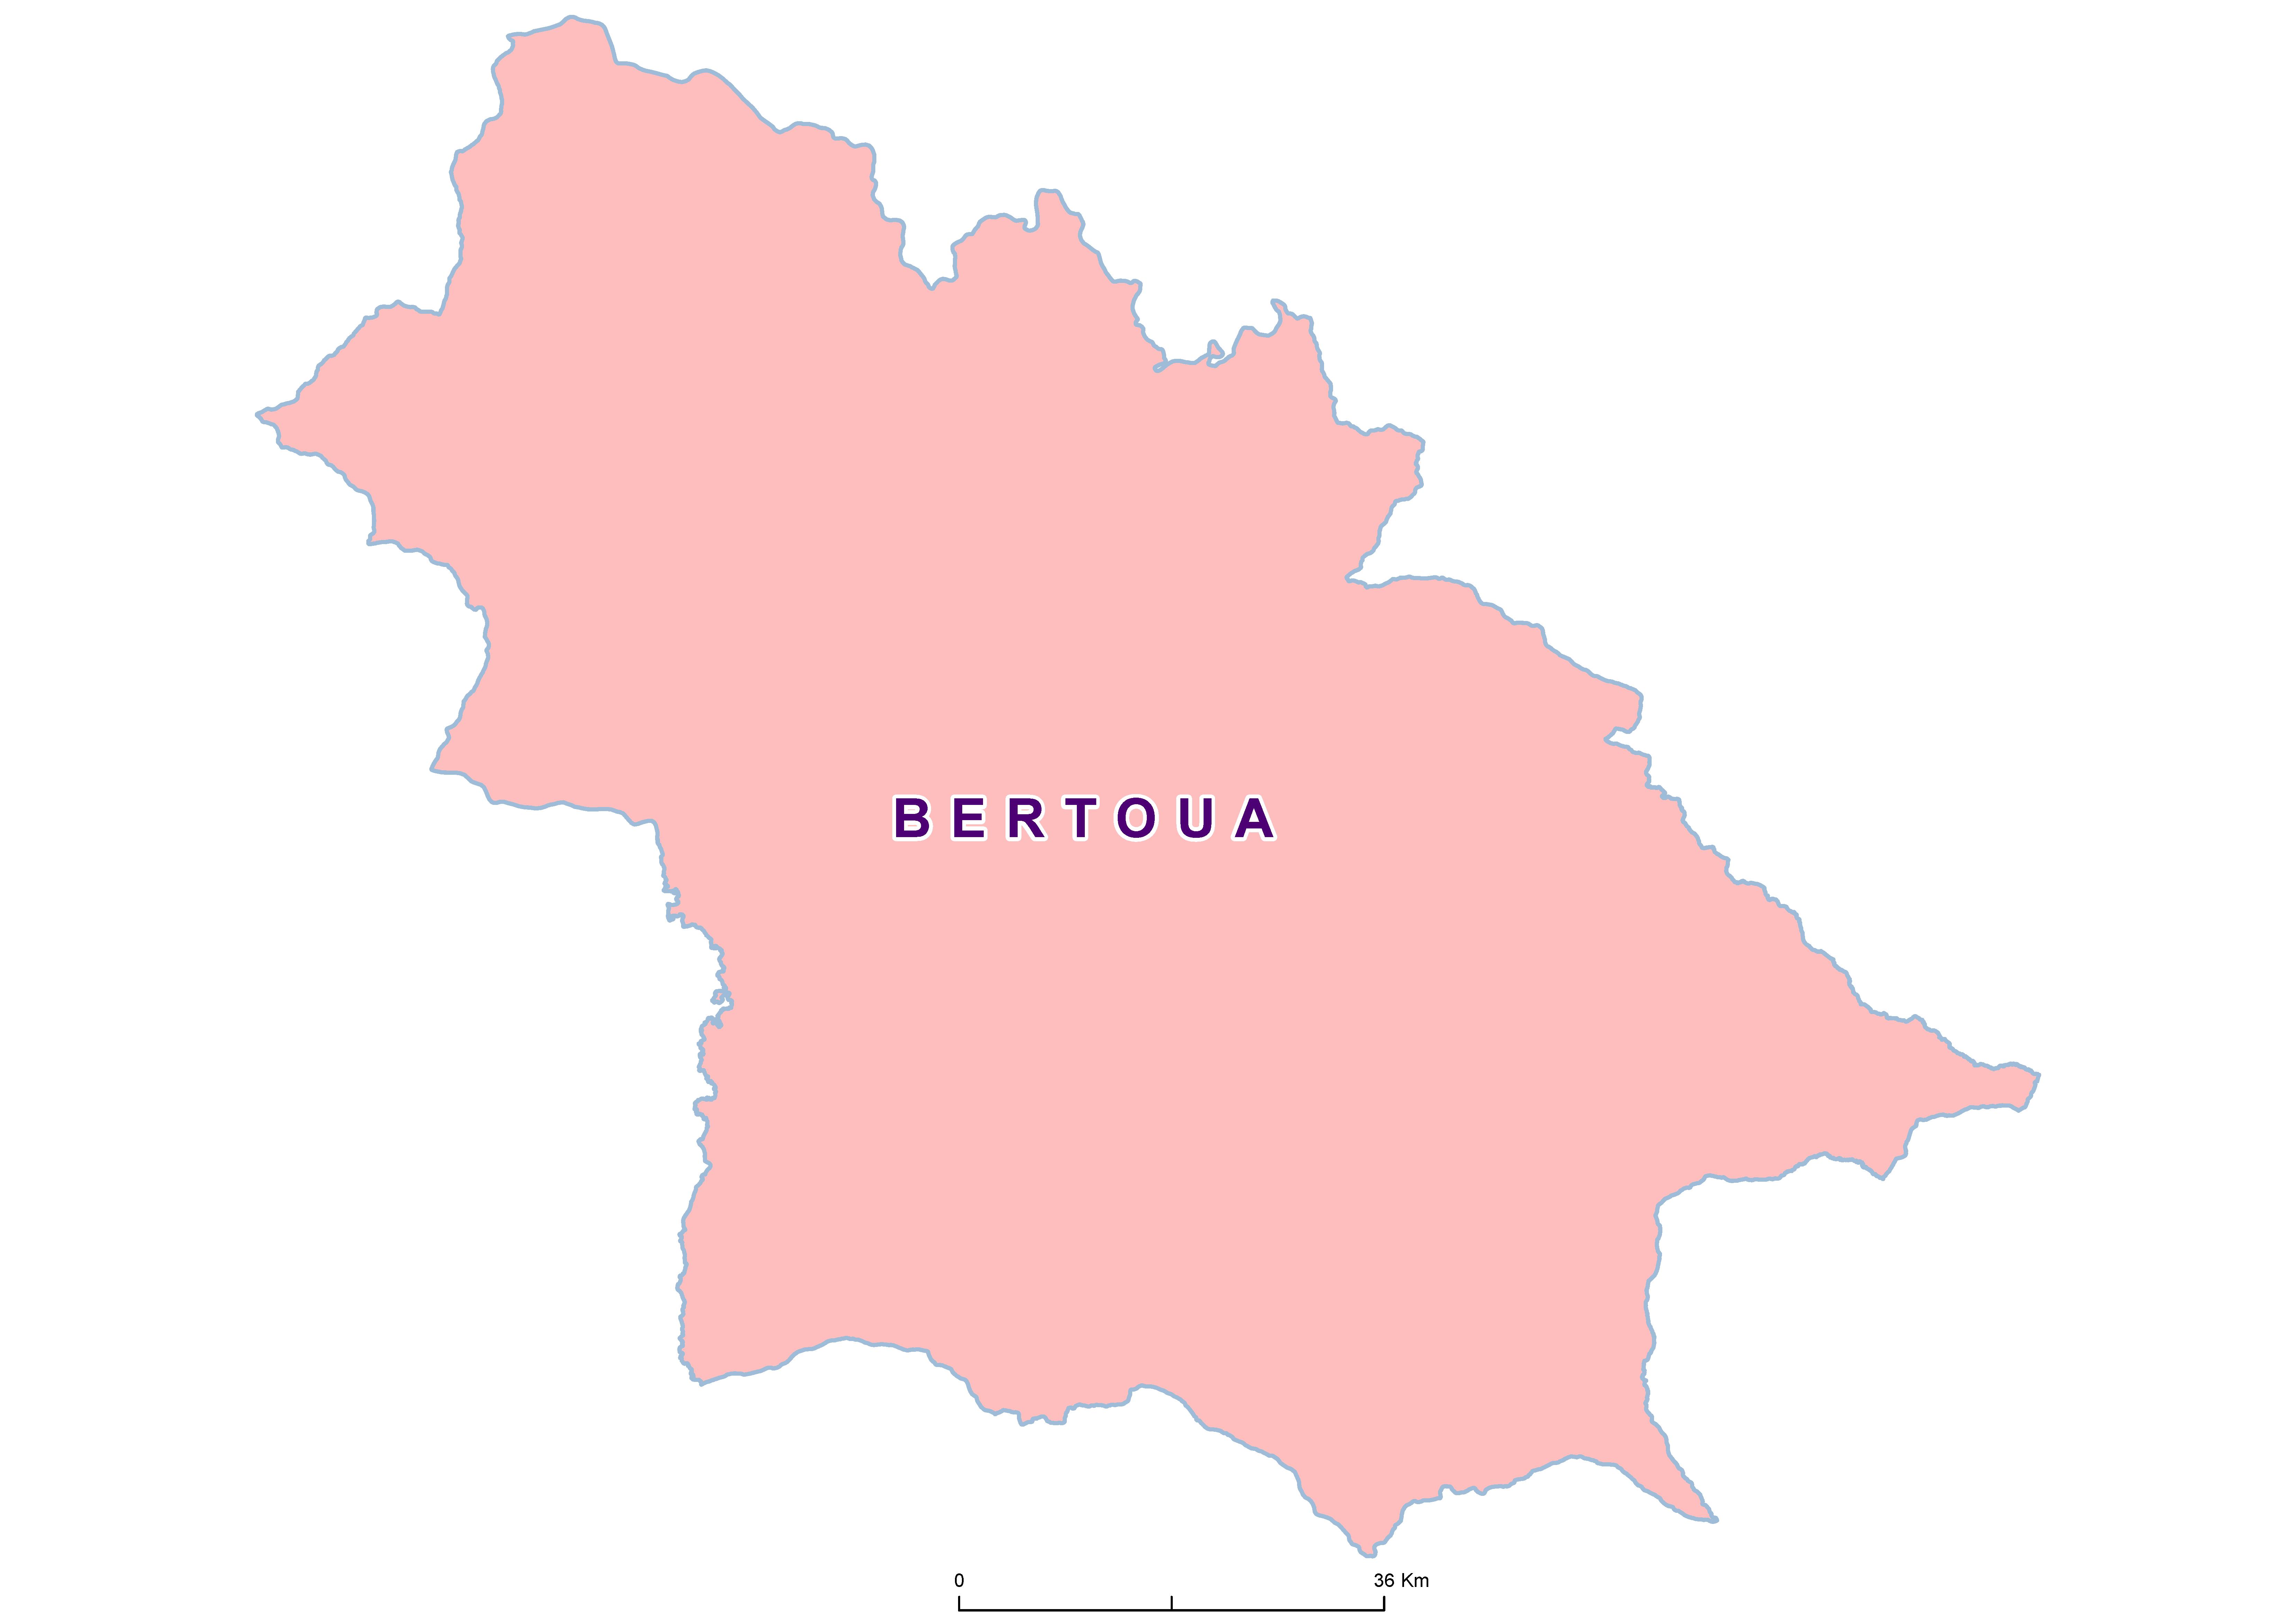 Bertoua Mean SCH 19850001